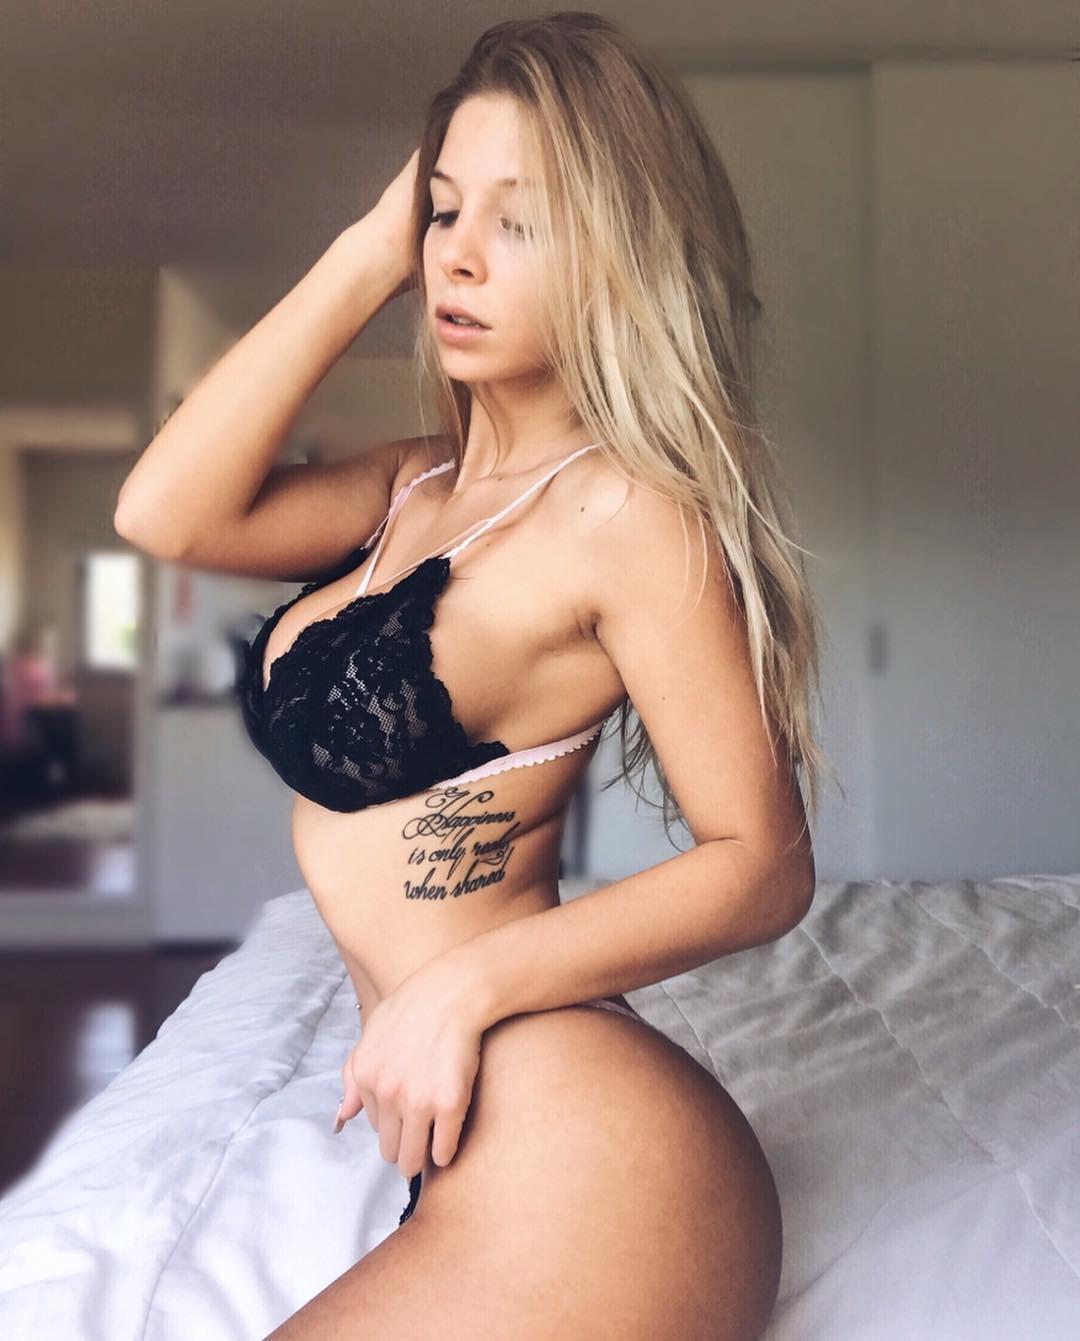 Romina malaspina nude